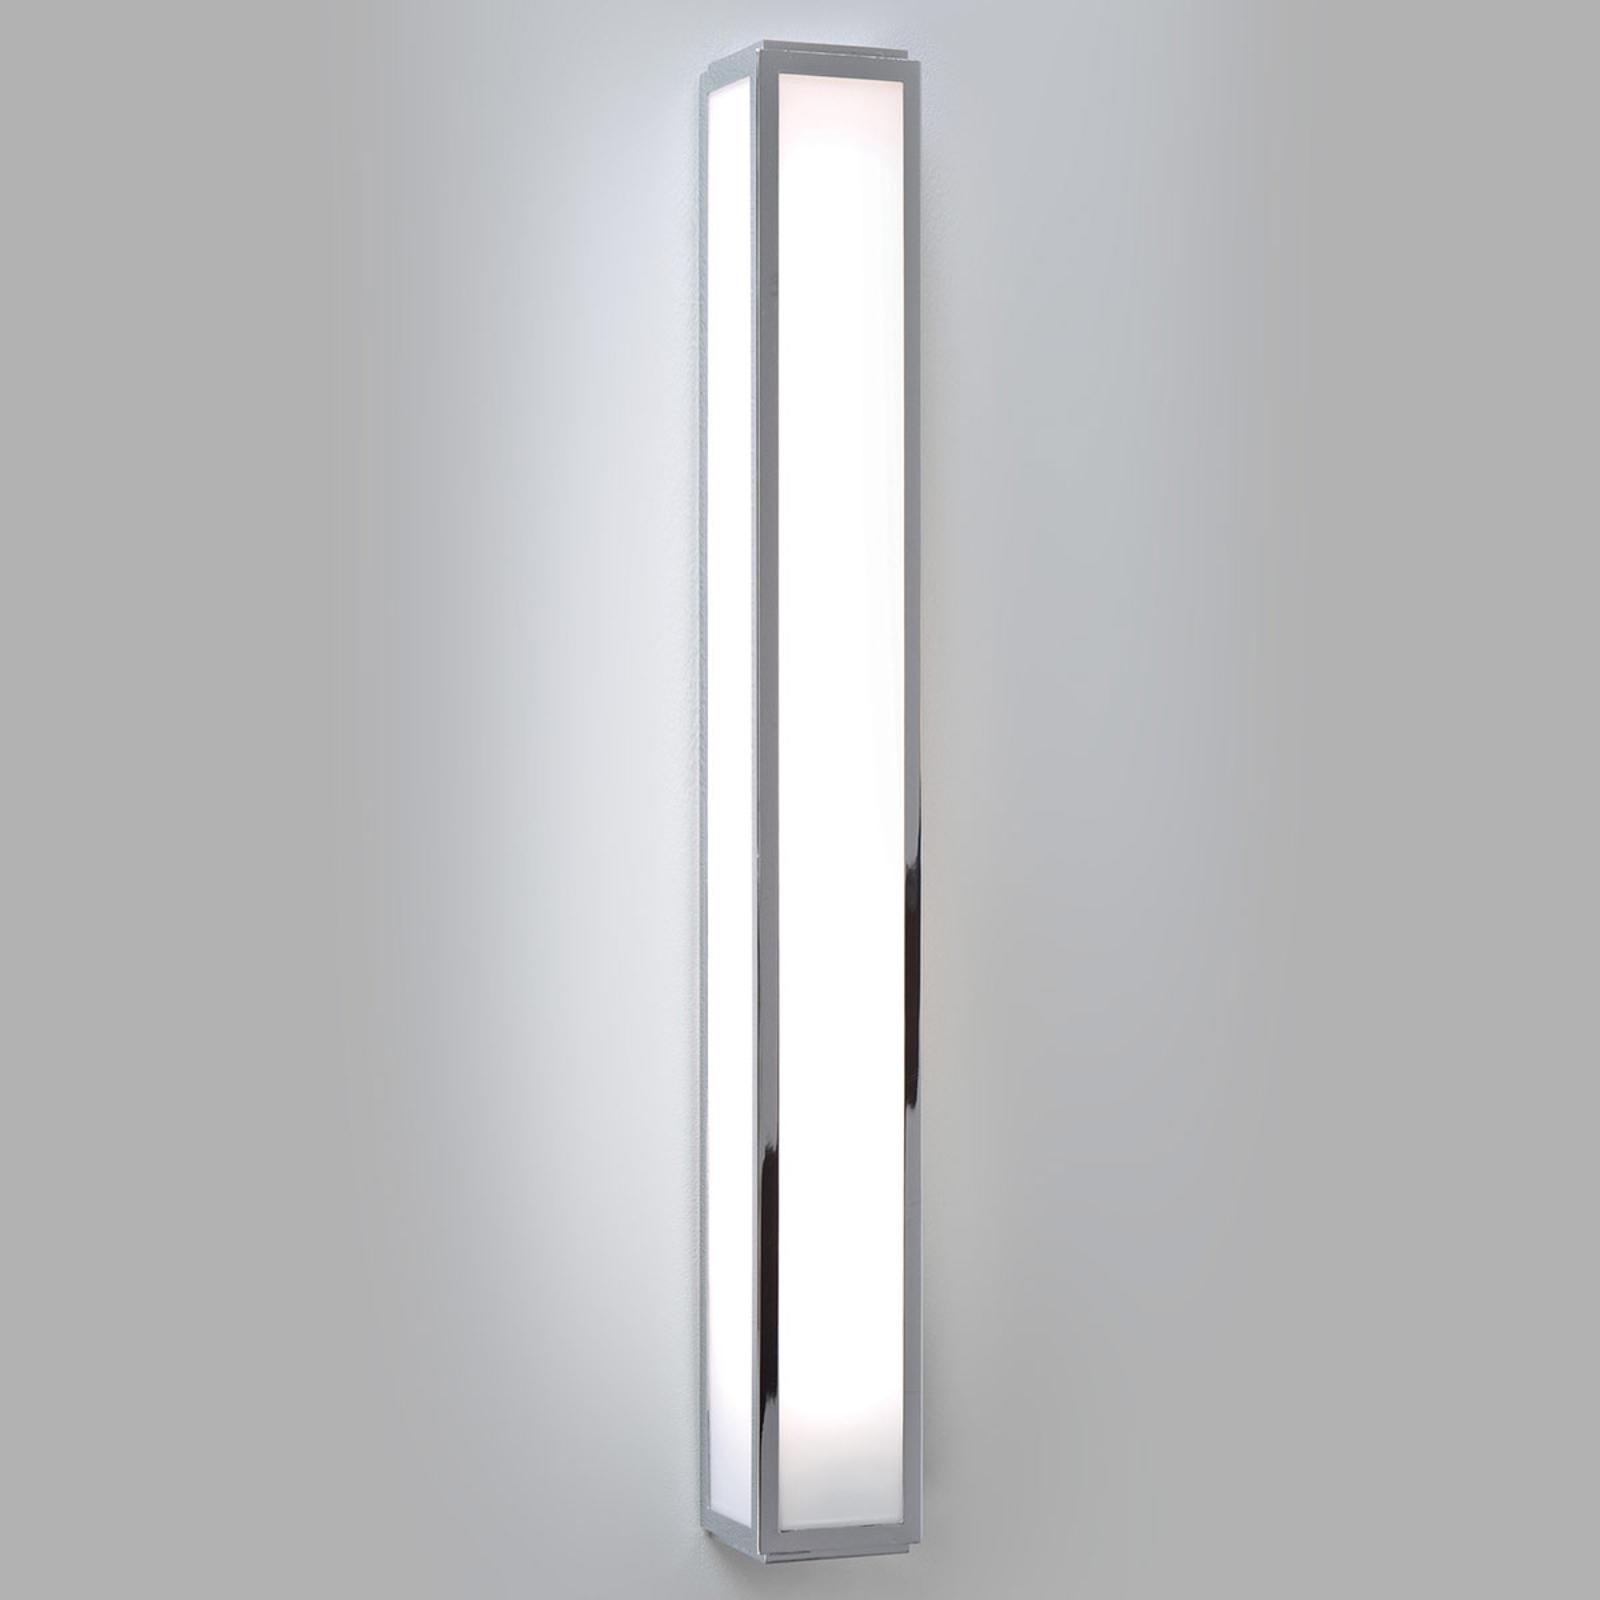 Astro Mashiko nástenné LED svietidlo kúpeľňa 60cm_1020485_1